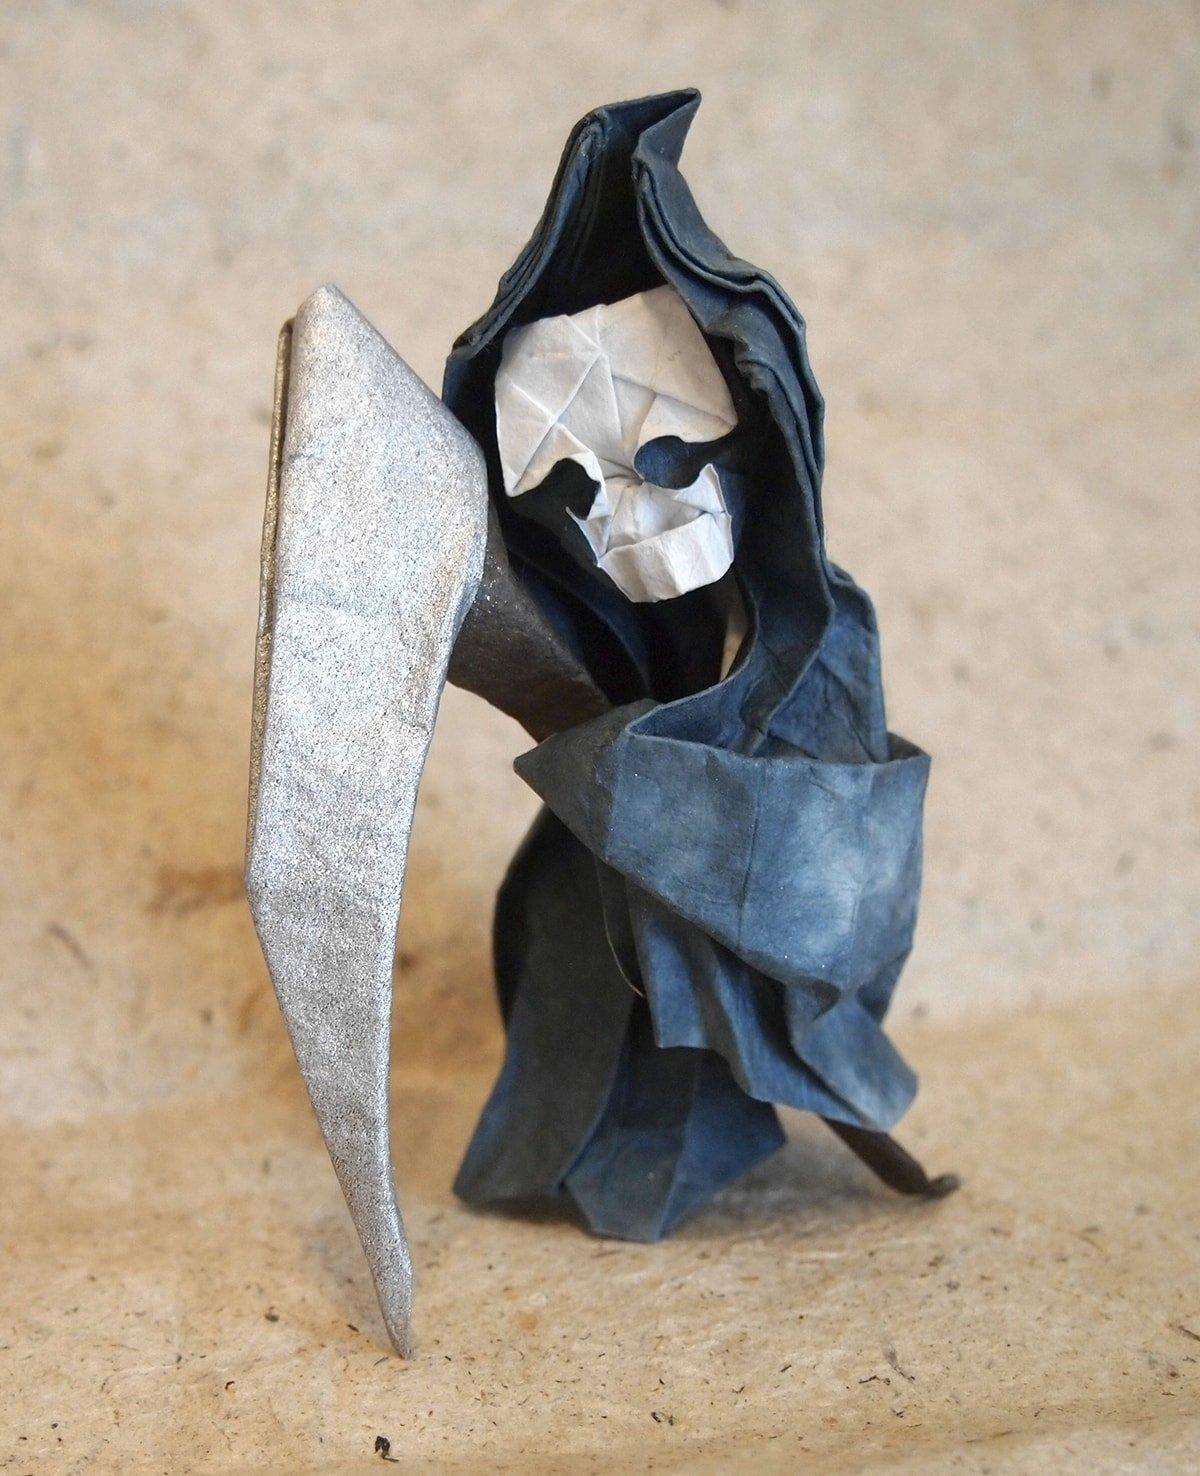 Grim Reaper by Hiroaki Kobayashi